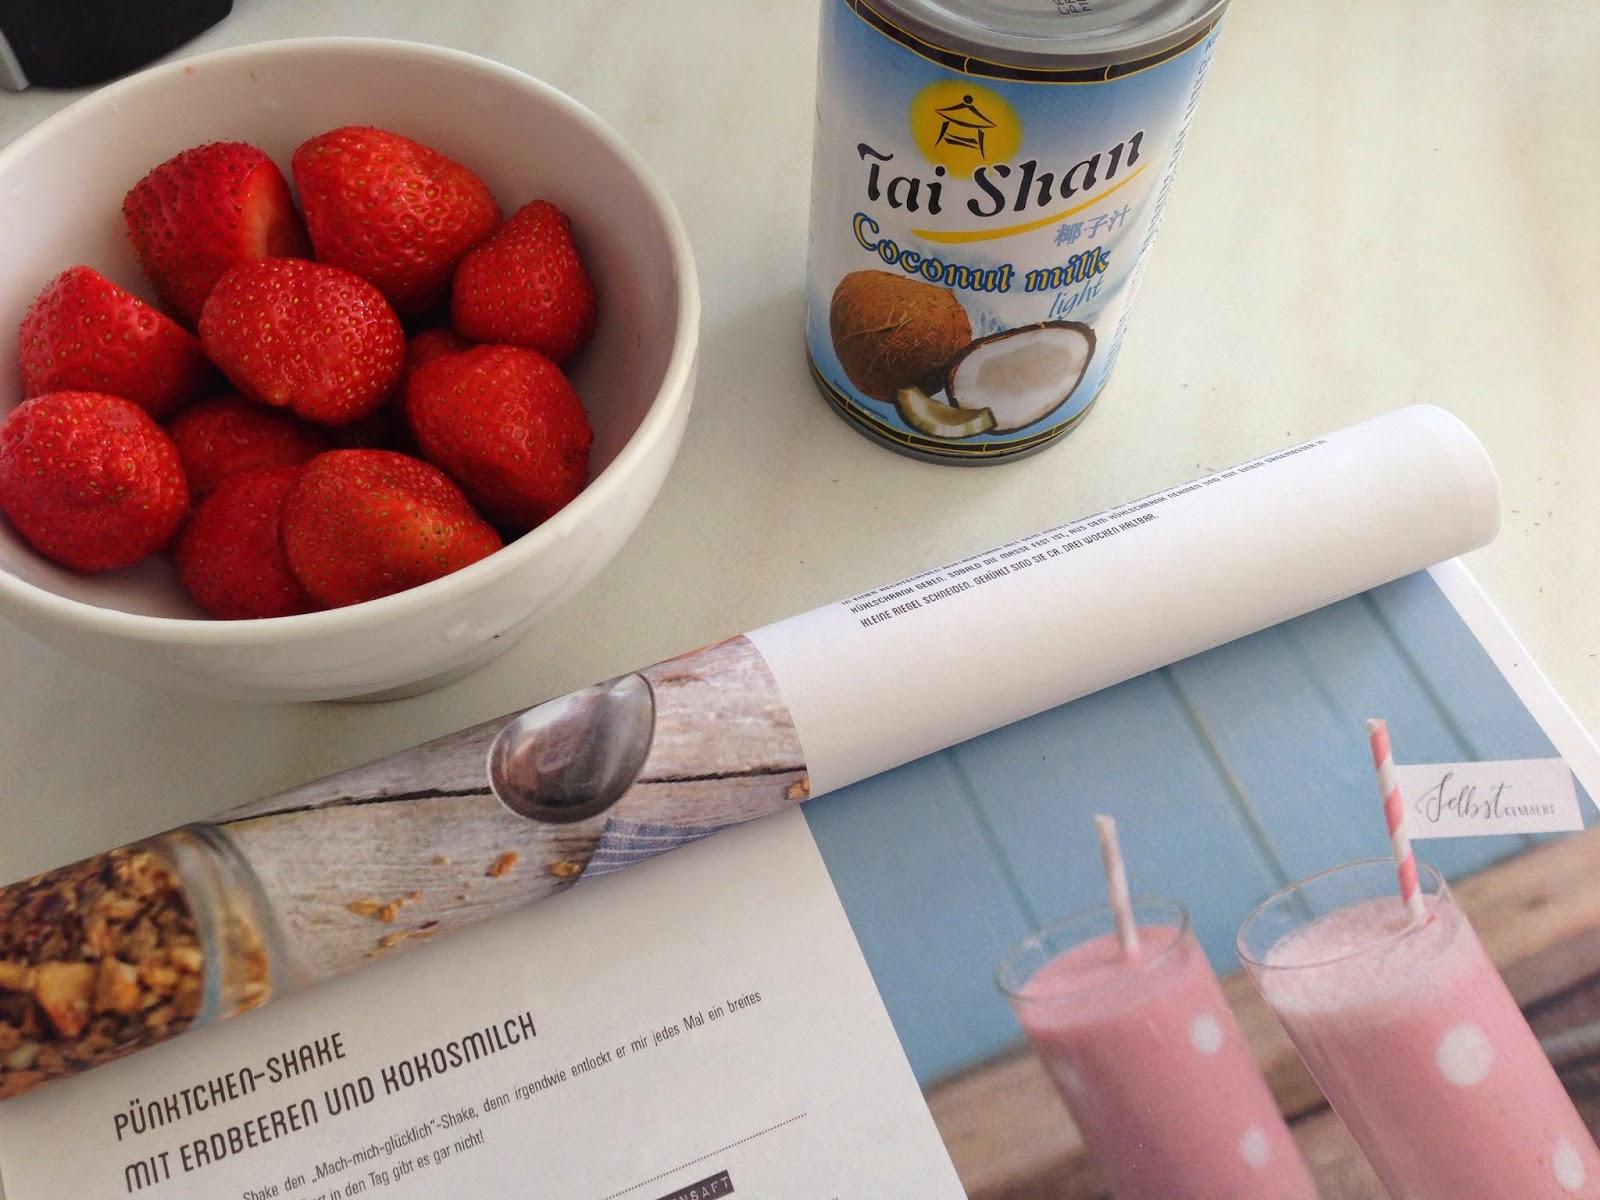 Erdbeer-Kokos-Quark Shake: Die Zutaten